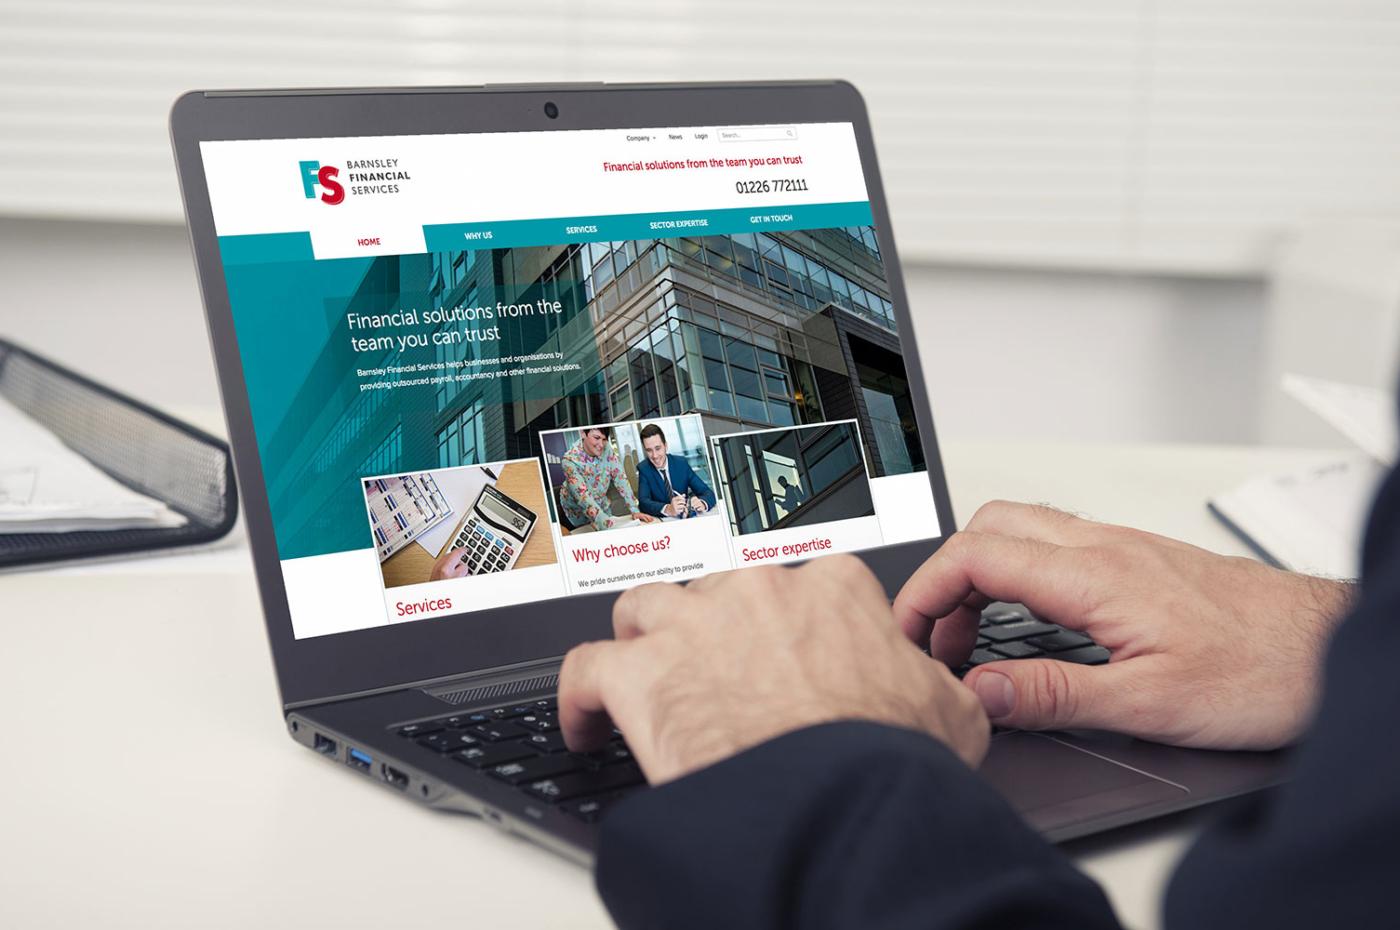 Barnsley Financial Service web design